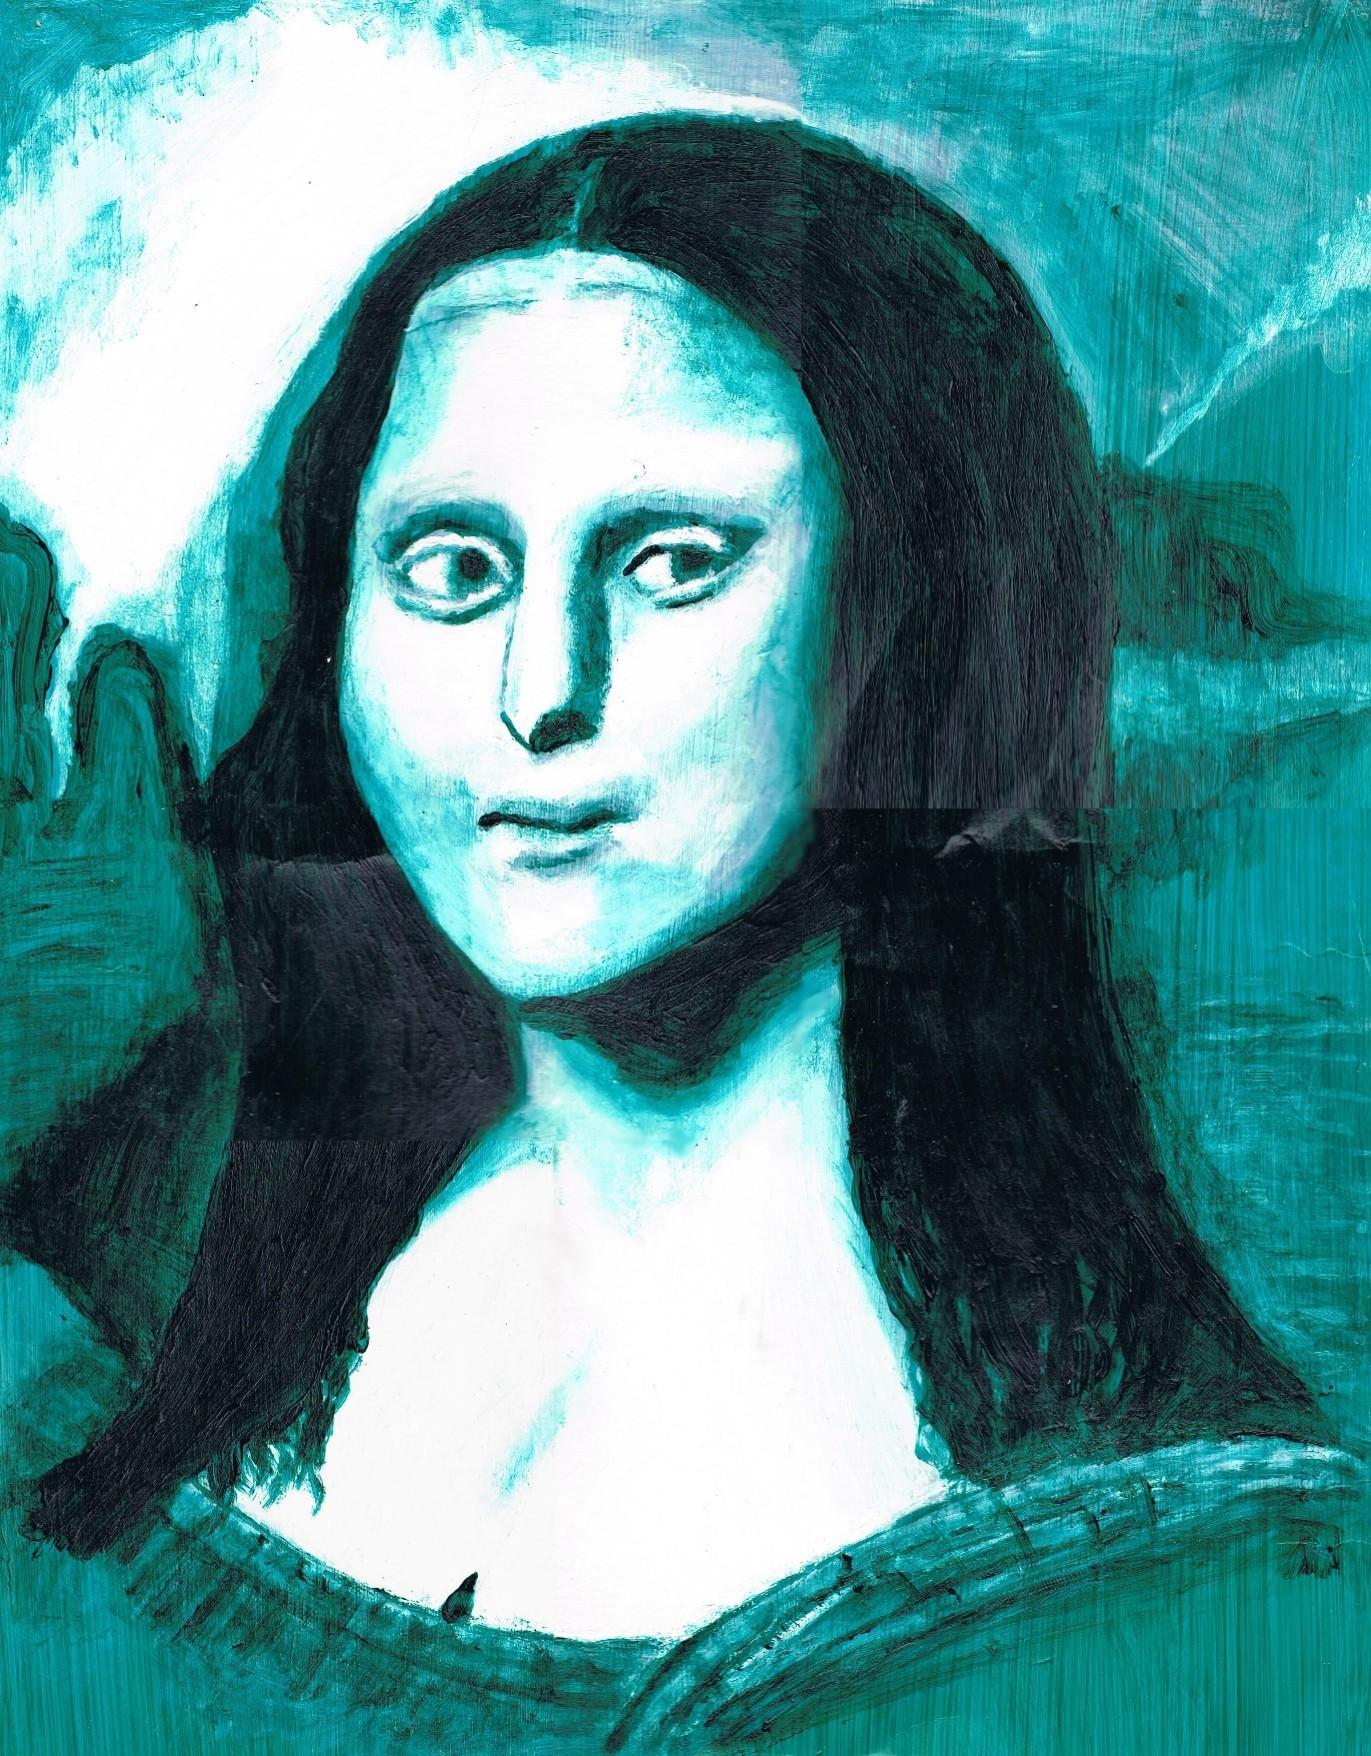 Mona Lisa Blue Bitch